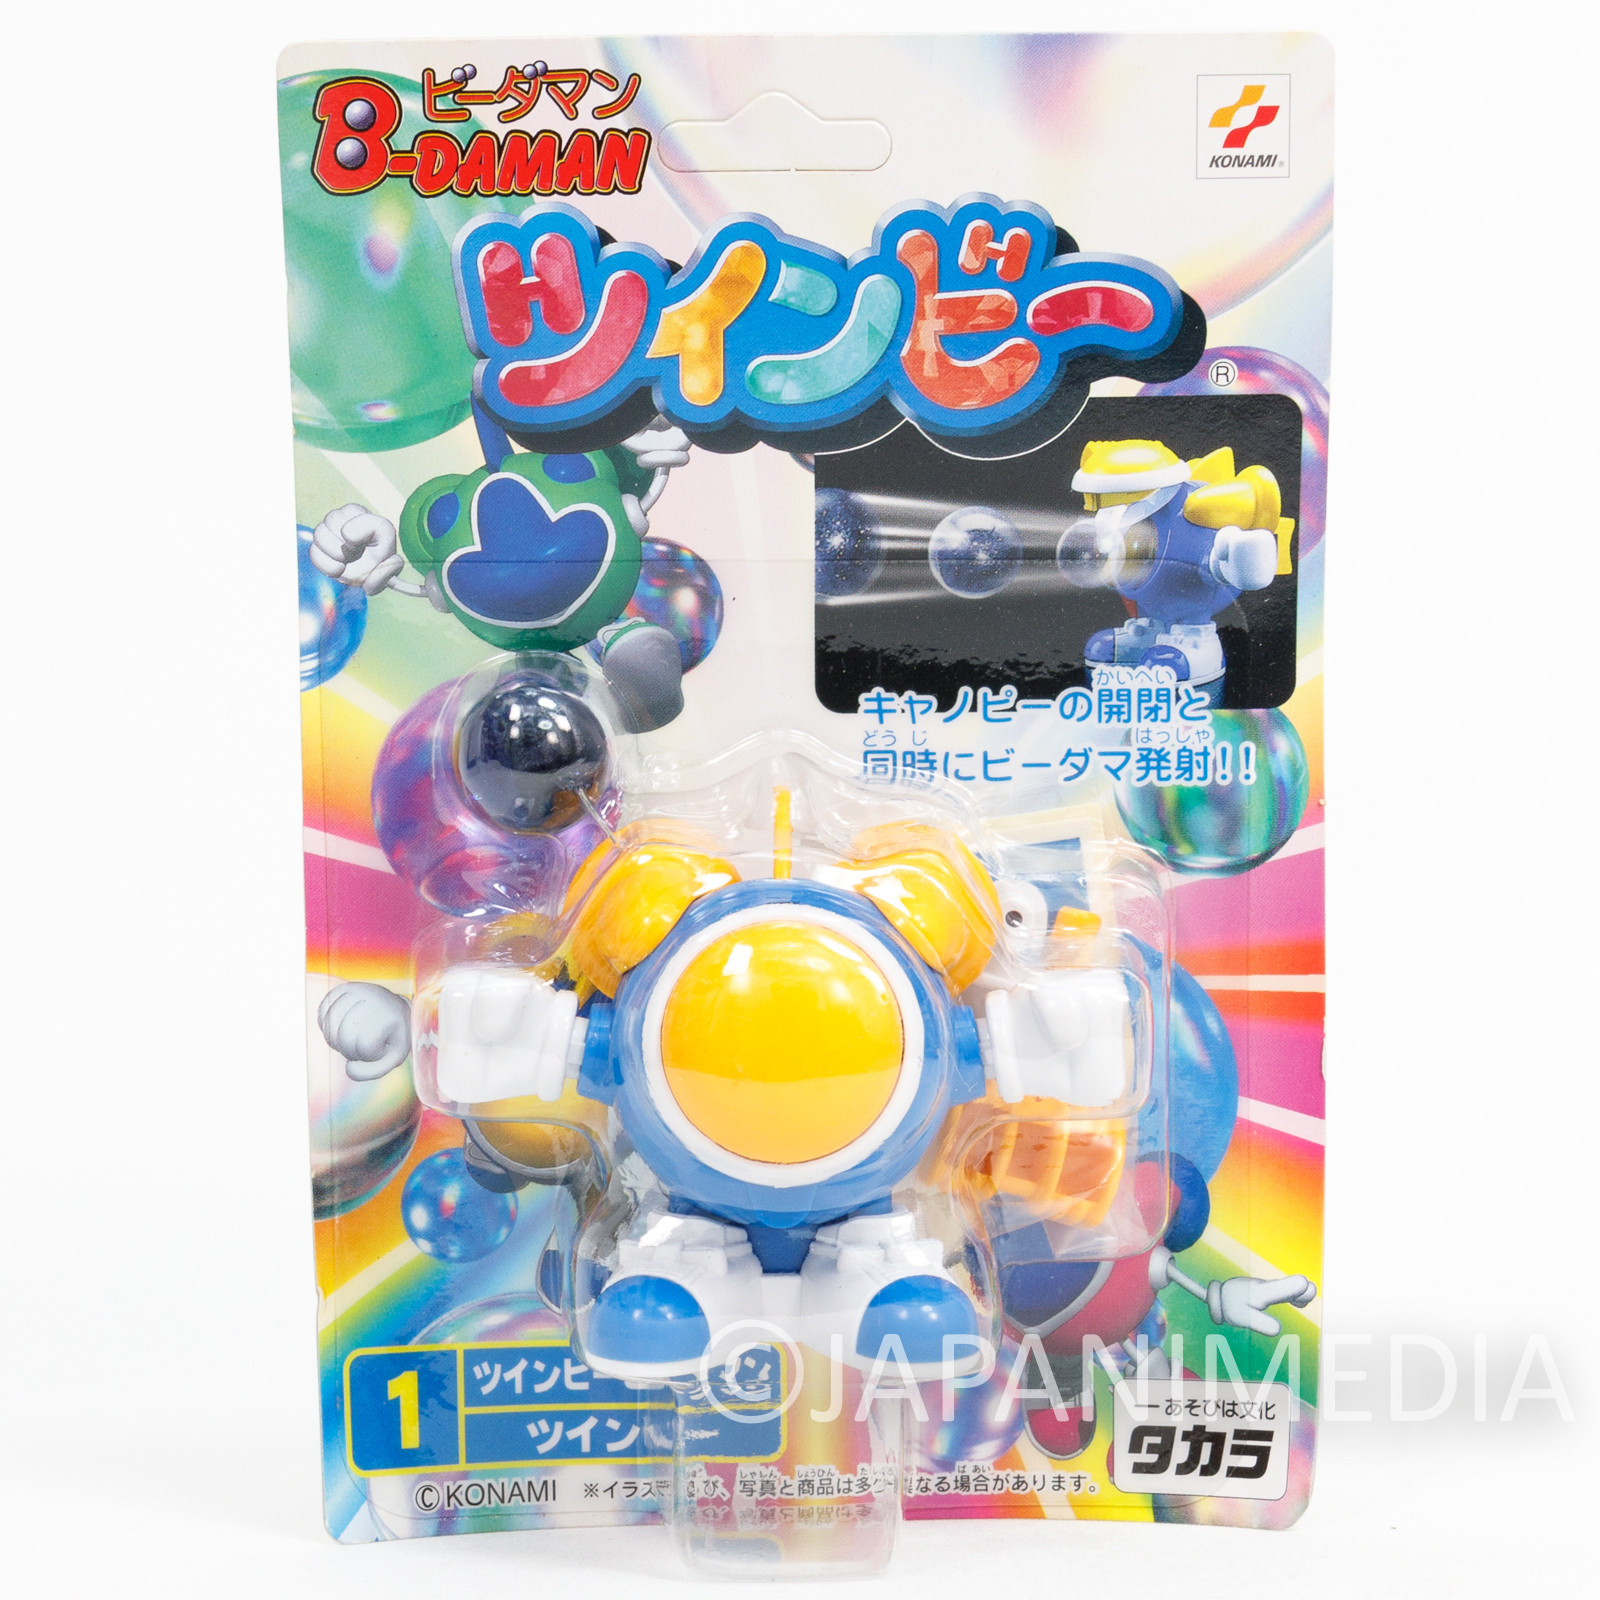 RARE! TwinBee B-daman Toy Figure Takara JAPAN GAME FAMICOM NES